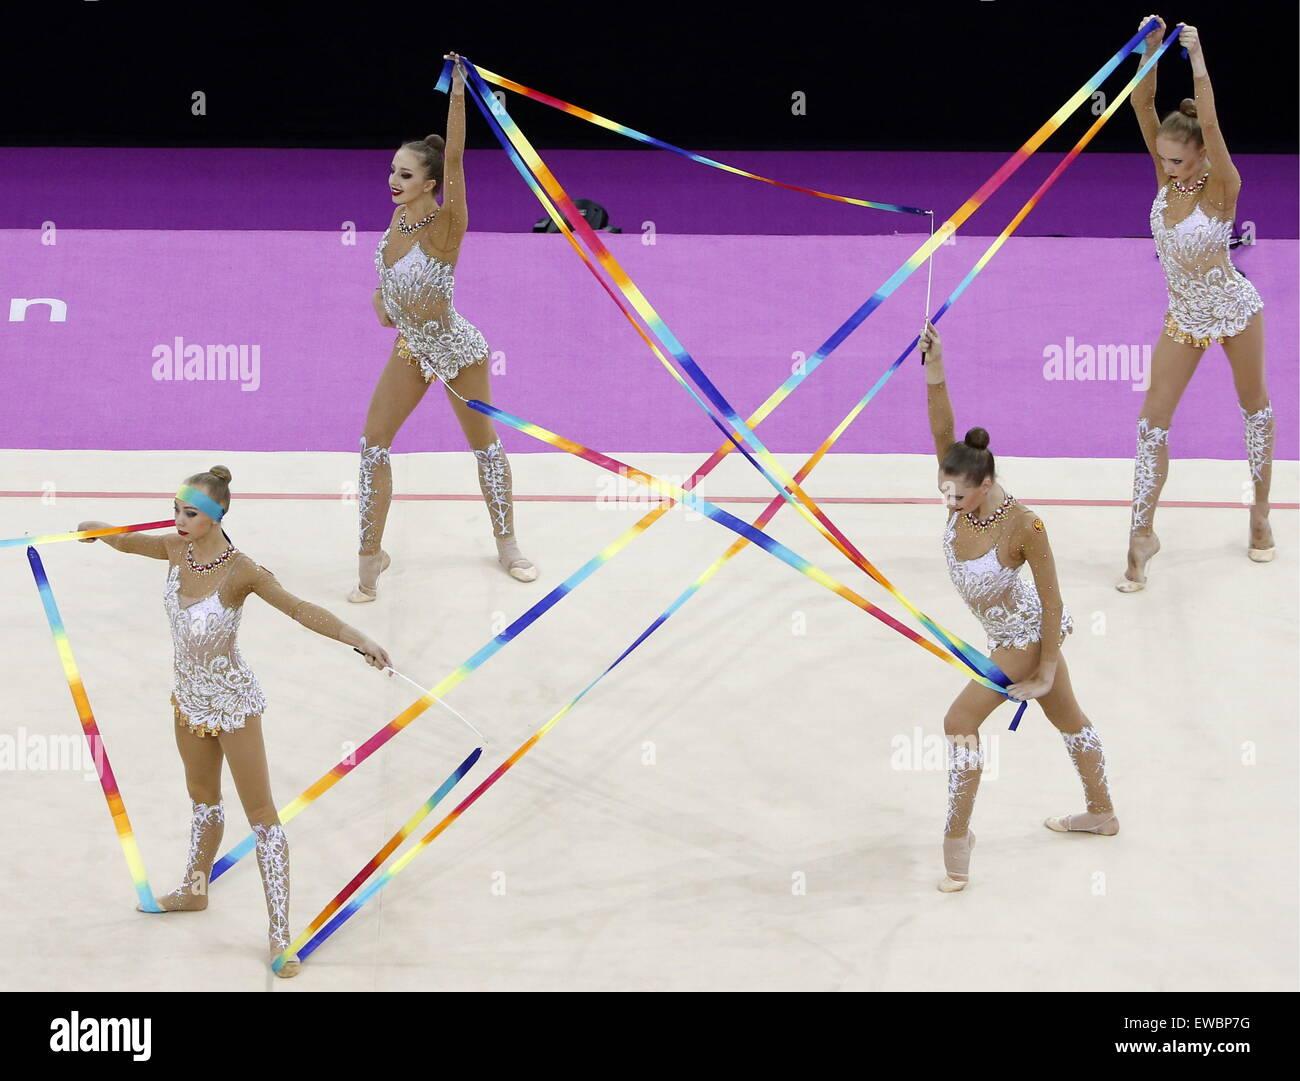 Winwin gymnastics - Win Win Gymnastics 2015